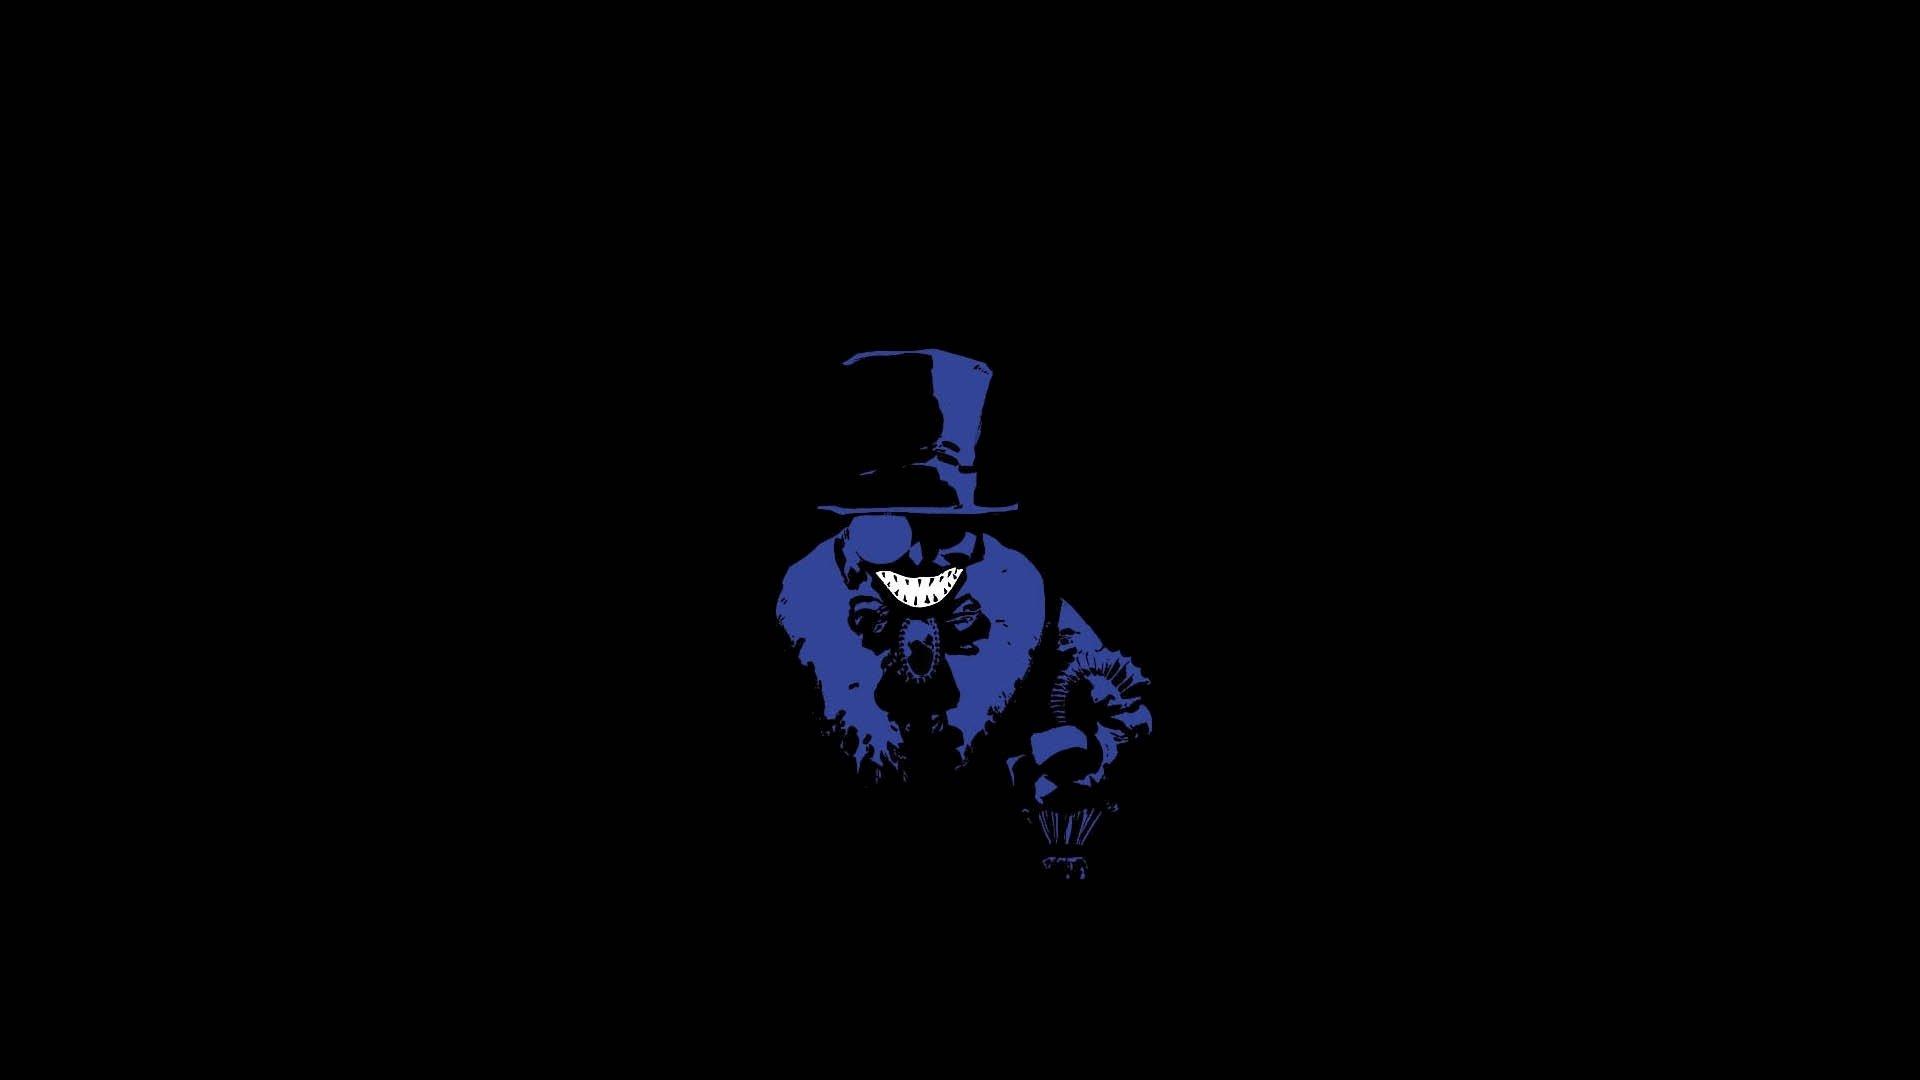 Animated Penguin Wallpaper Batman Dark Victory Hd Wallpaper Background Image